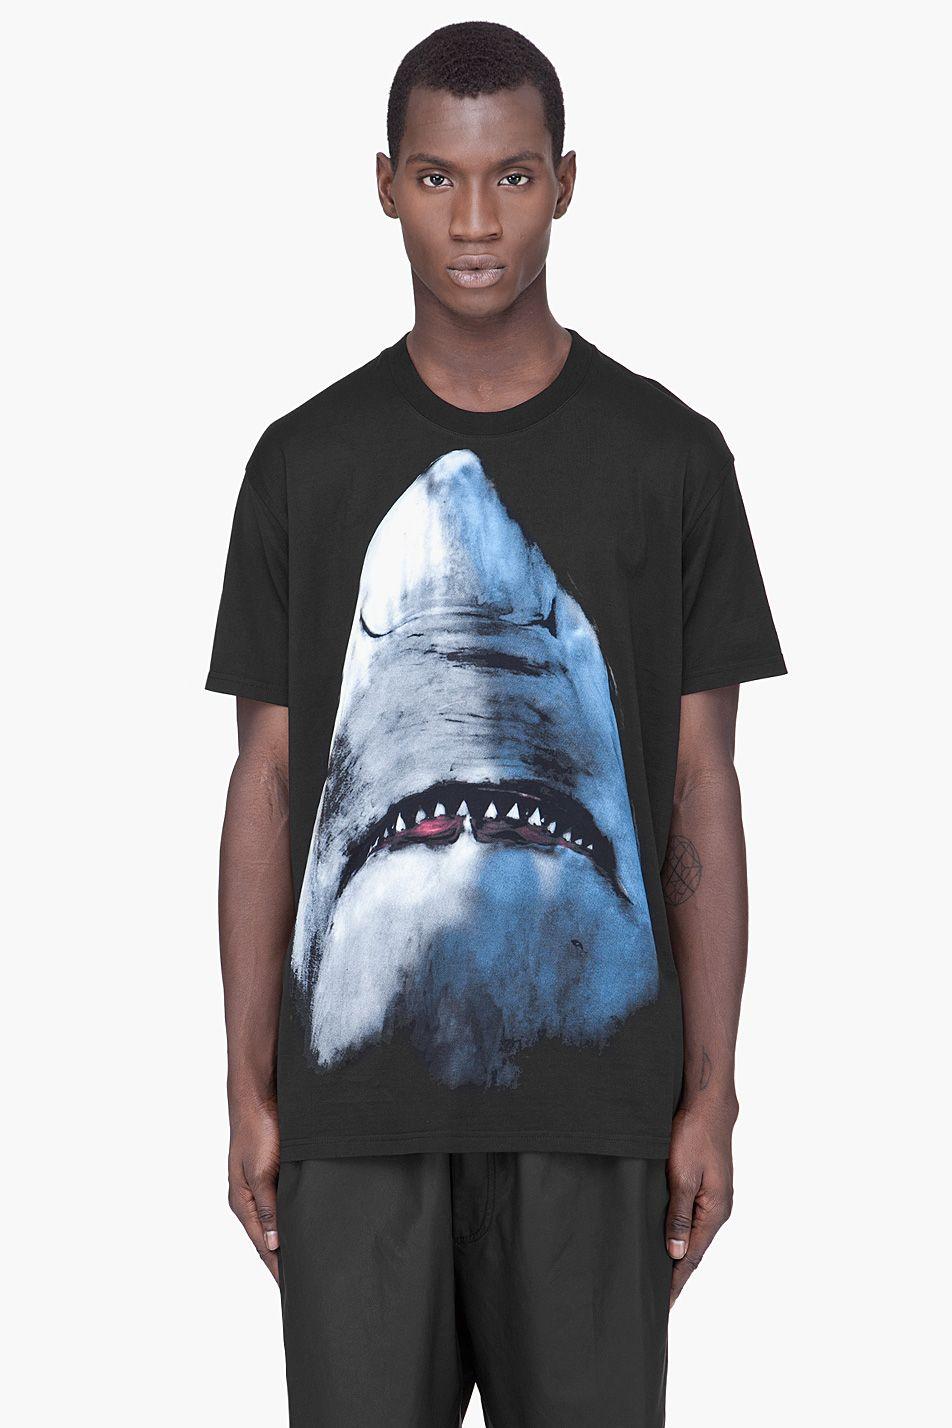 GIVENCHY Black Shark Print Oversized T-Shirt | S.T.Y.L.E ...